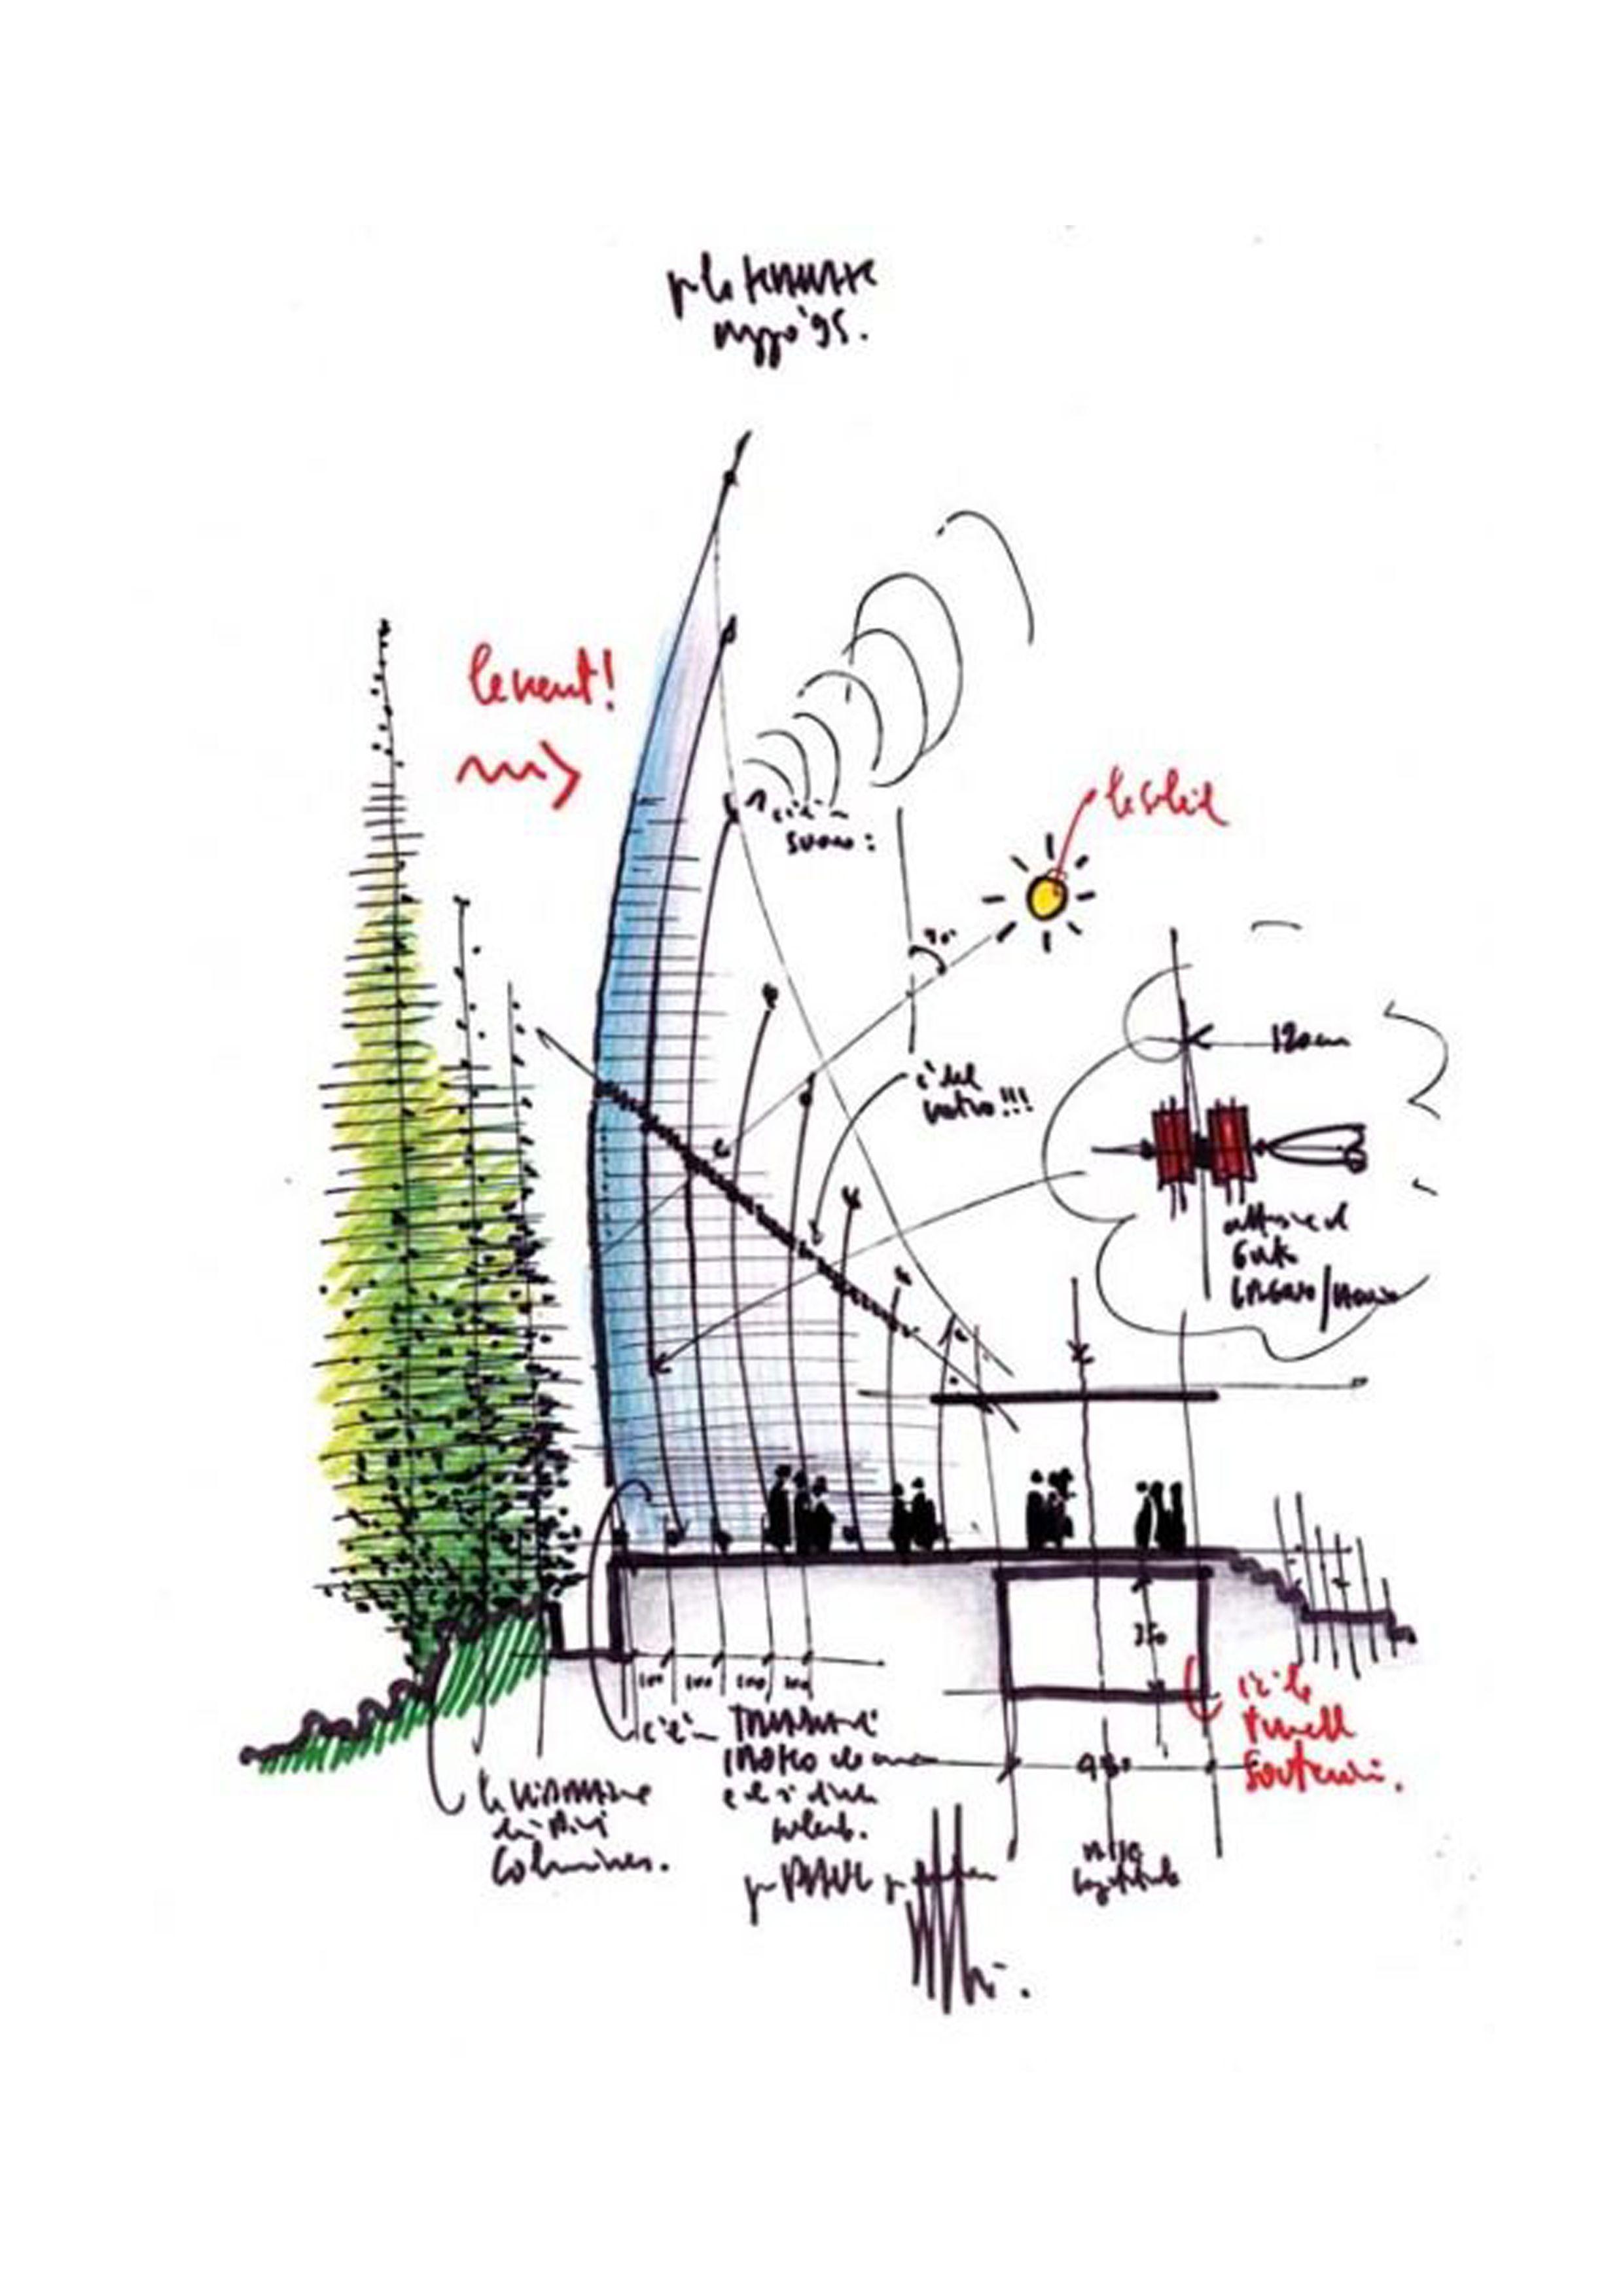 Pin De Leticia En Bocetos Modelo De Arquitectura De Paisaje Dibujo De Arquitectura Croquis Arquitectura